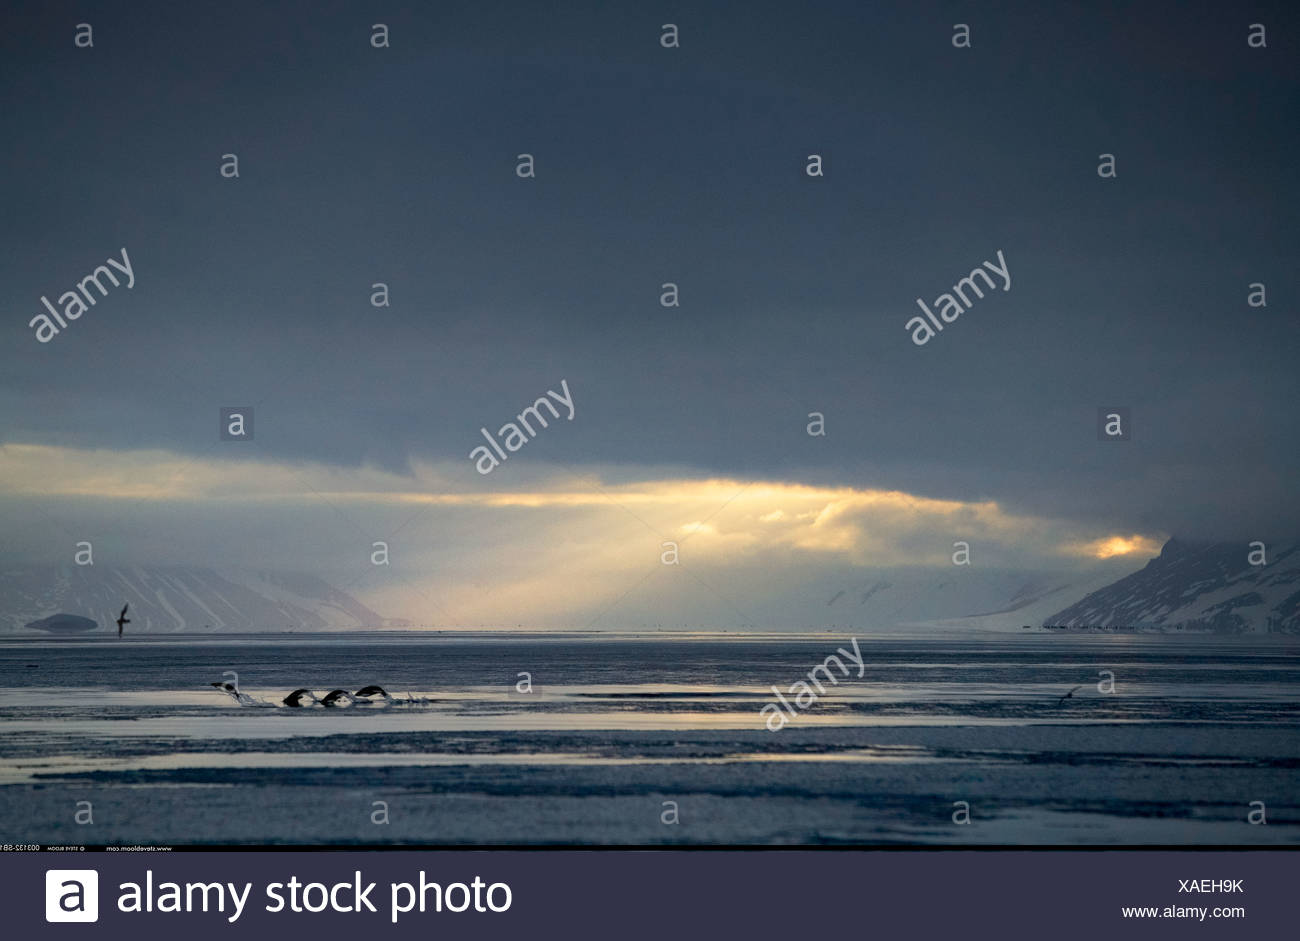 Adelie penguins nuoto Cape Adare Antartide Immagini Stock